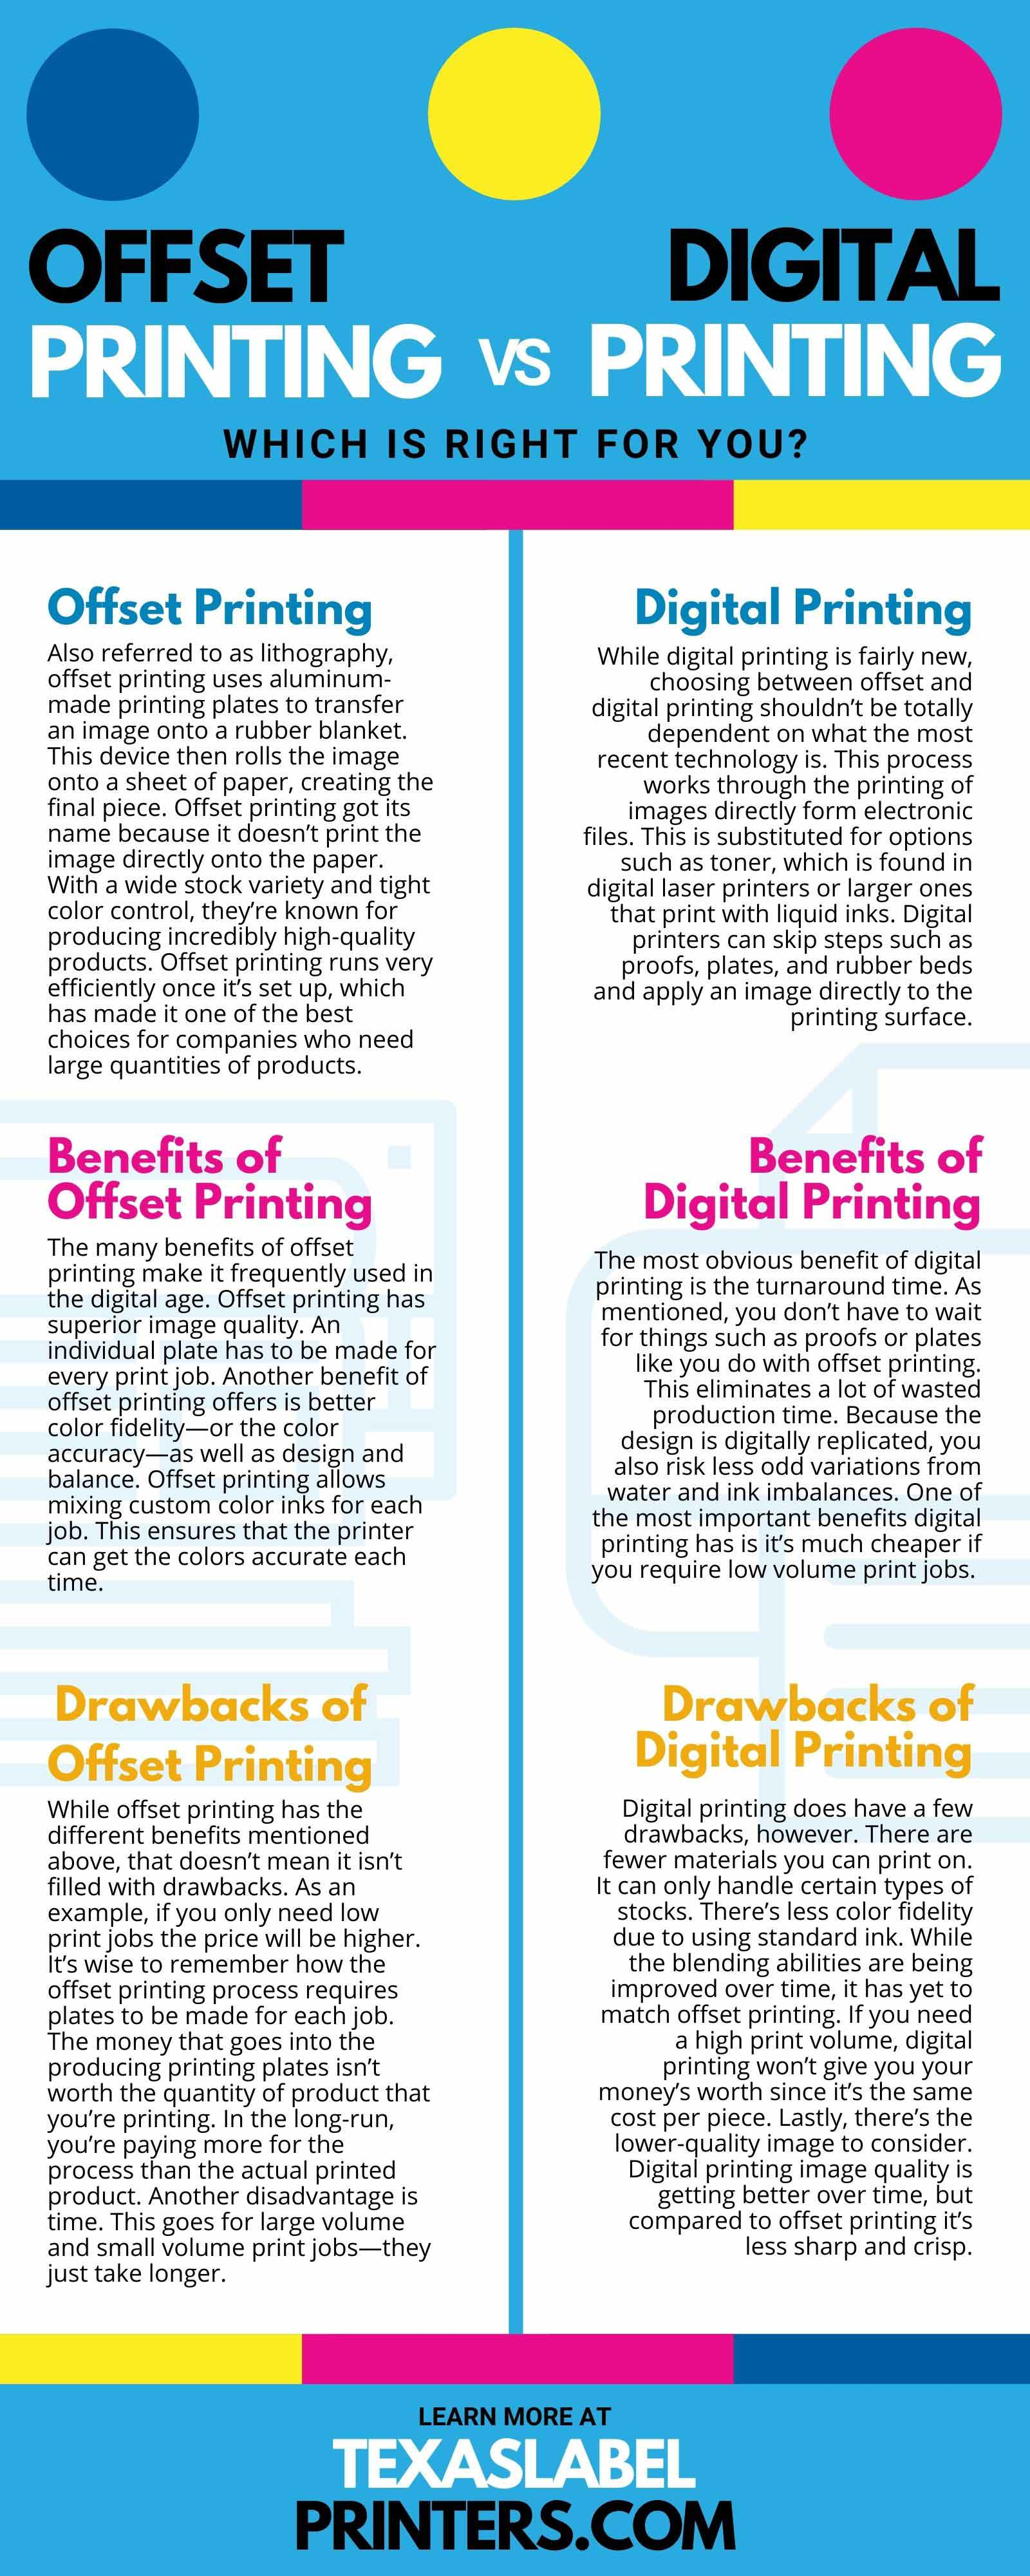 Offset Printing Versus Digital Printing Infographic